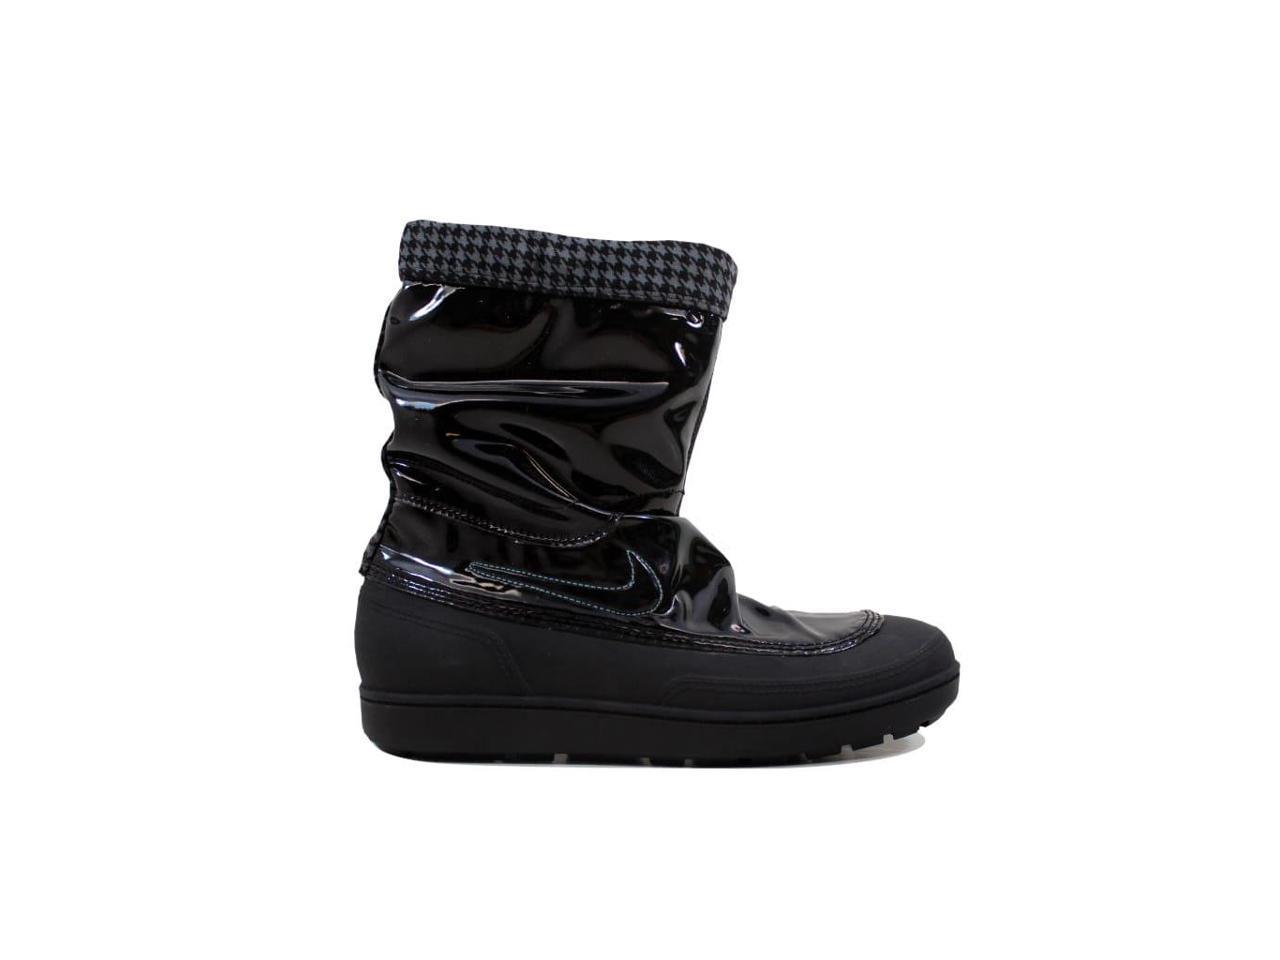 Nike Women's Aegina Mid Size Black/Black-Neo Turquoise454400-002 Size Mid 5.5 8f9a68